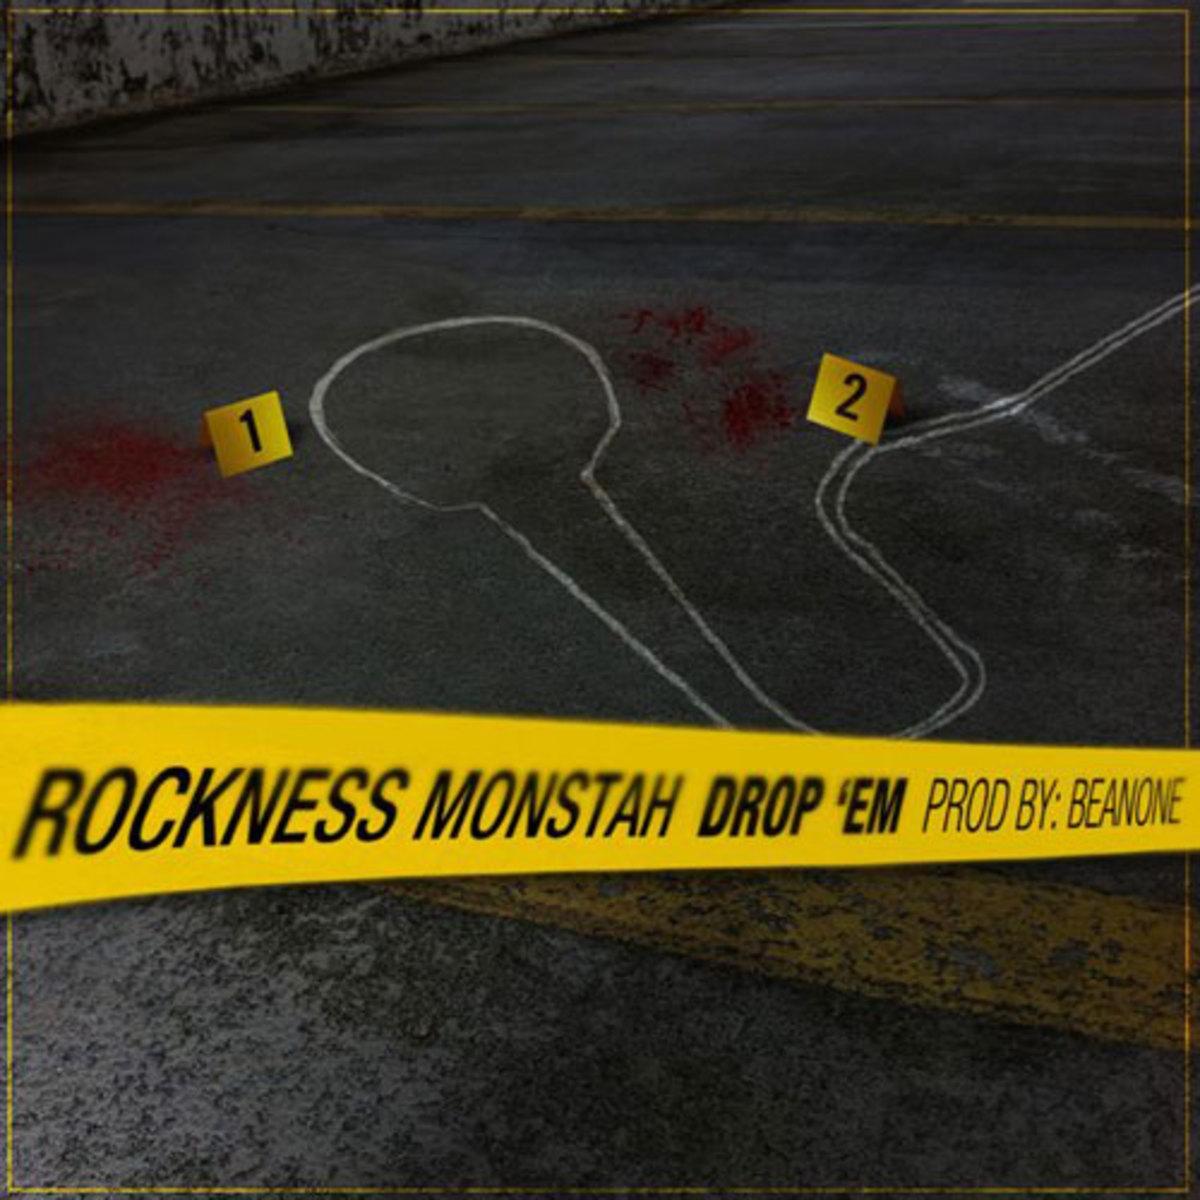 rocknessmonster-dropem.jpg